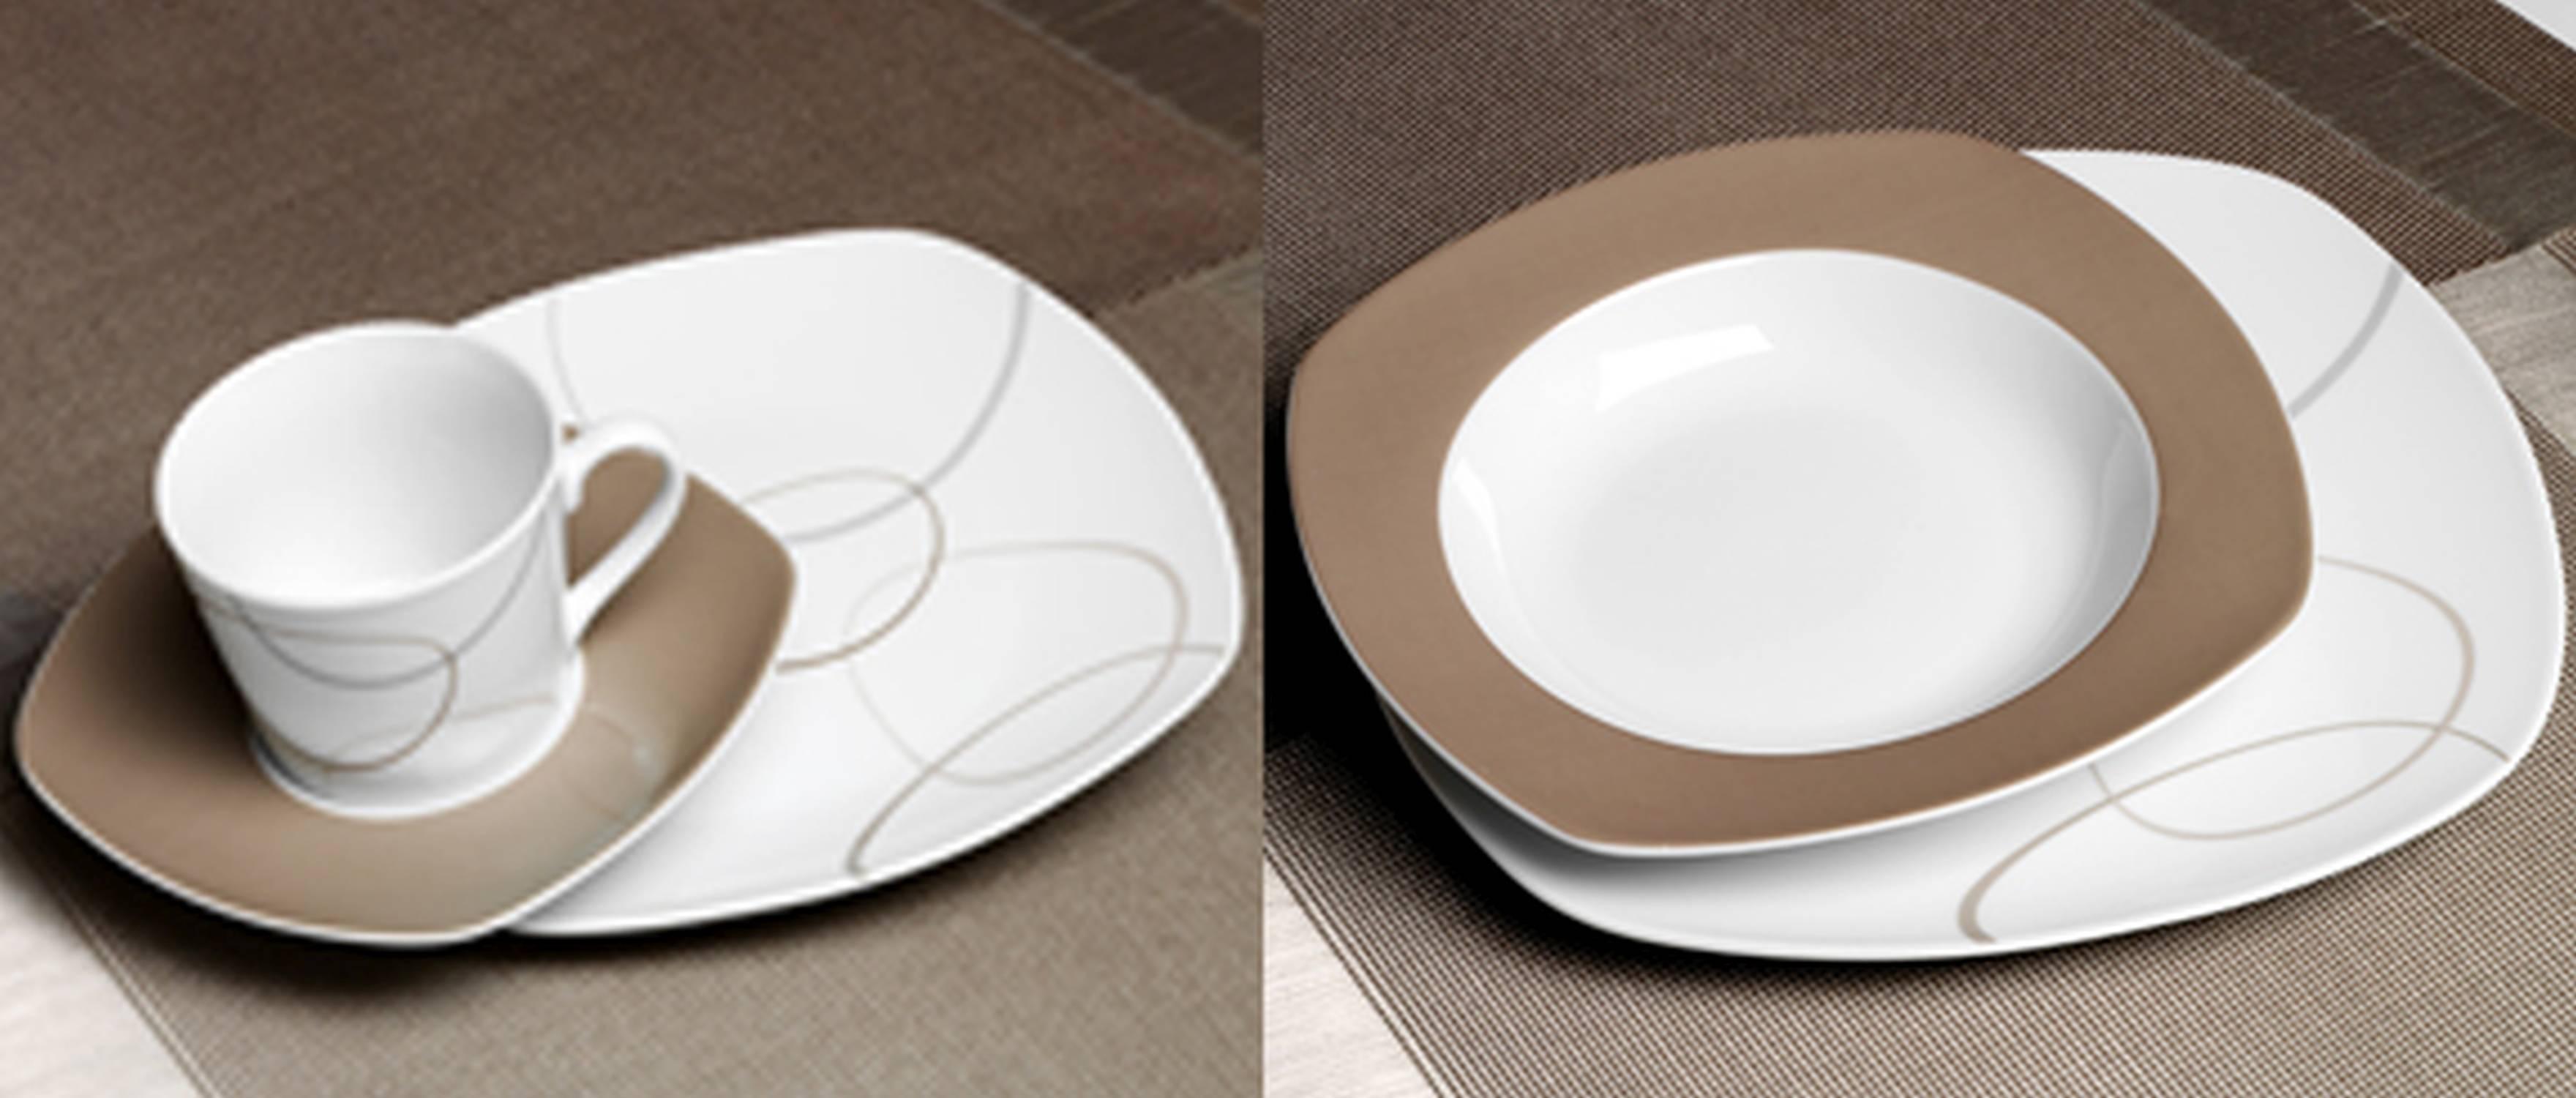 ritzenhoff breker kombiservice flirt porzellan serie alina marron 30 tlg neu gastro. Black Bedroom Furniture Sets. Home Design Ideas